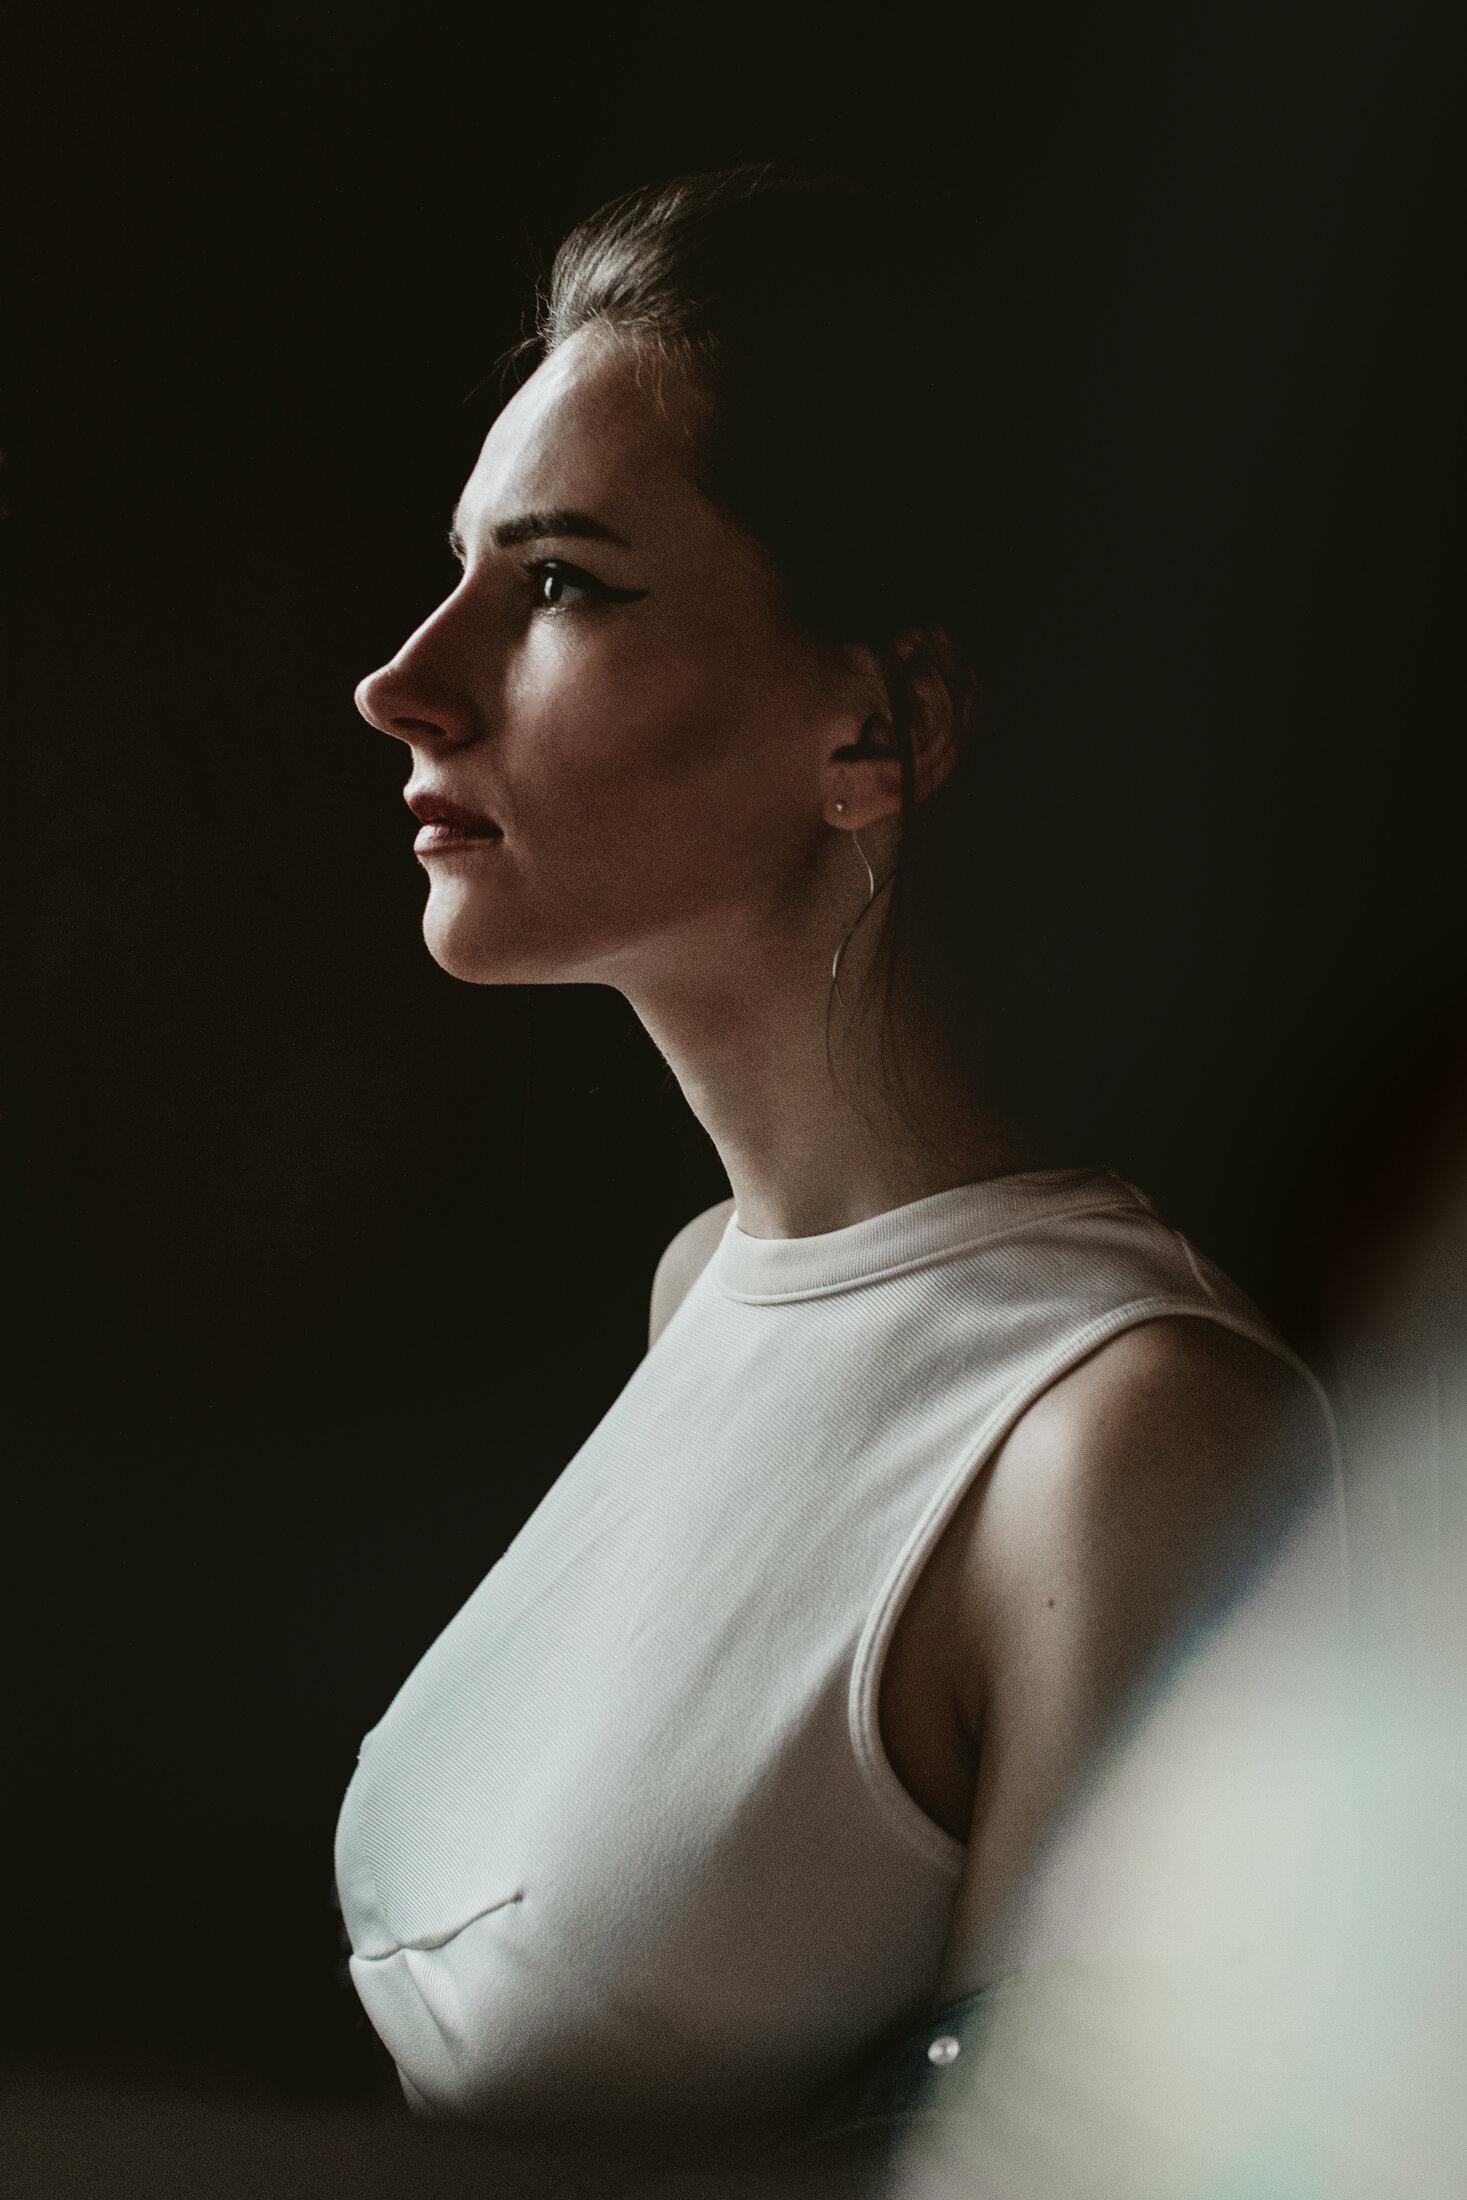 2020-1-11 BLOG Karolina Connolly - Kyiv, Ukraine - Jack Robert Photography-1.jpg